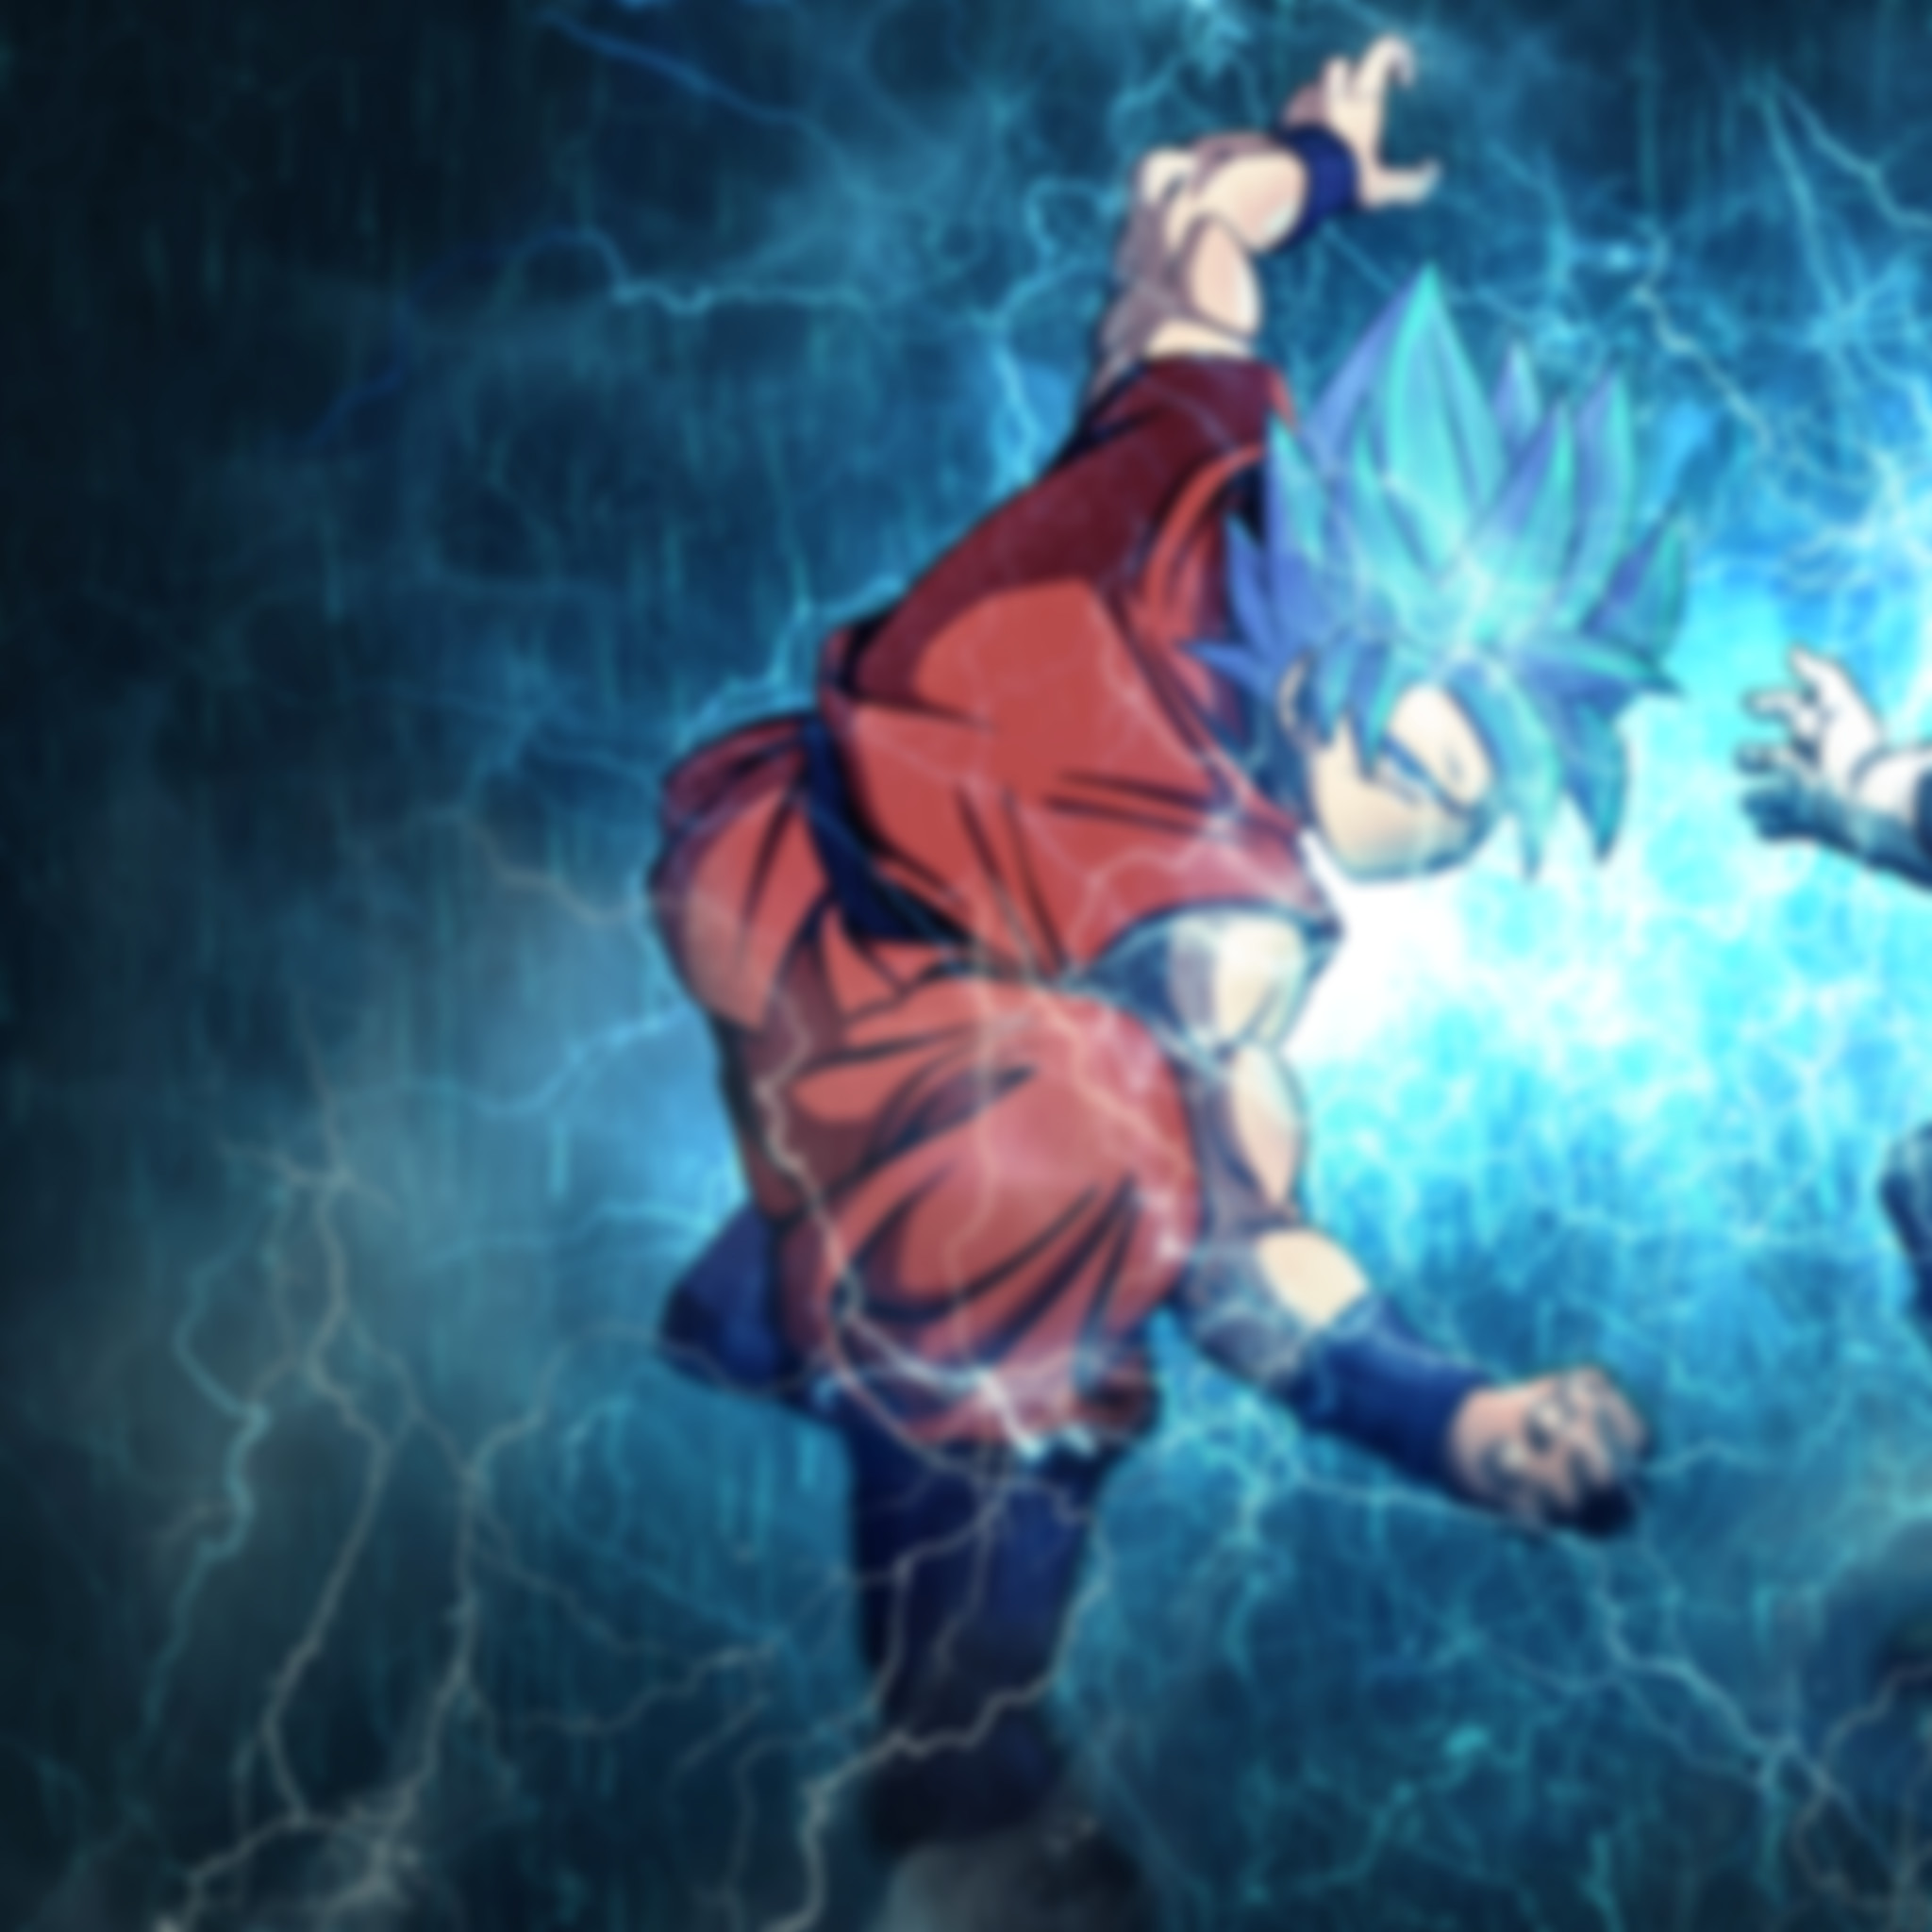 Goku Wallpaper Hd: Super Saiyan 4 Goku And Vegeta Wallpapers (60+ Images